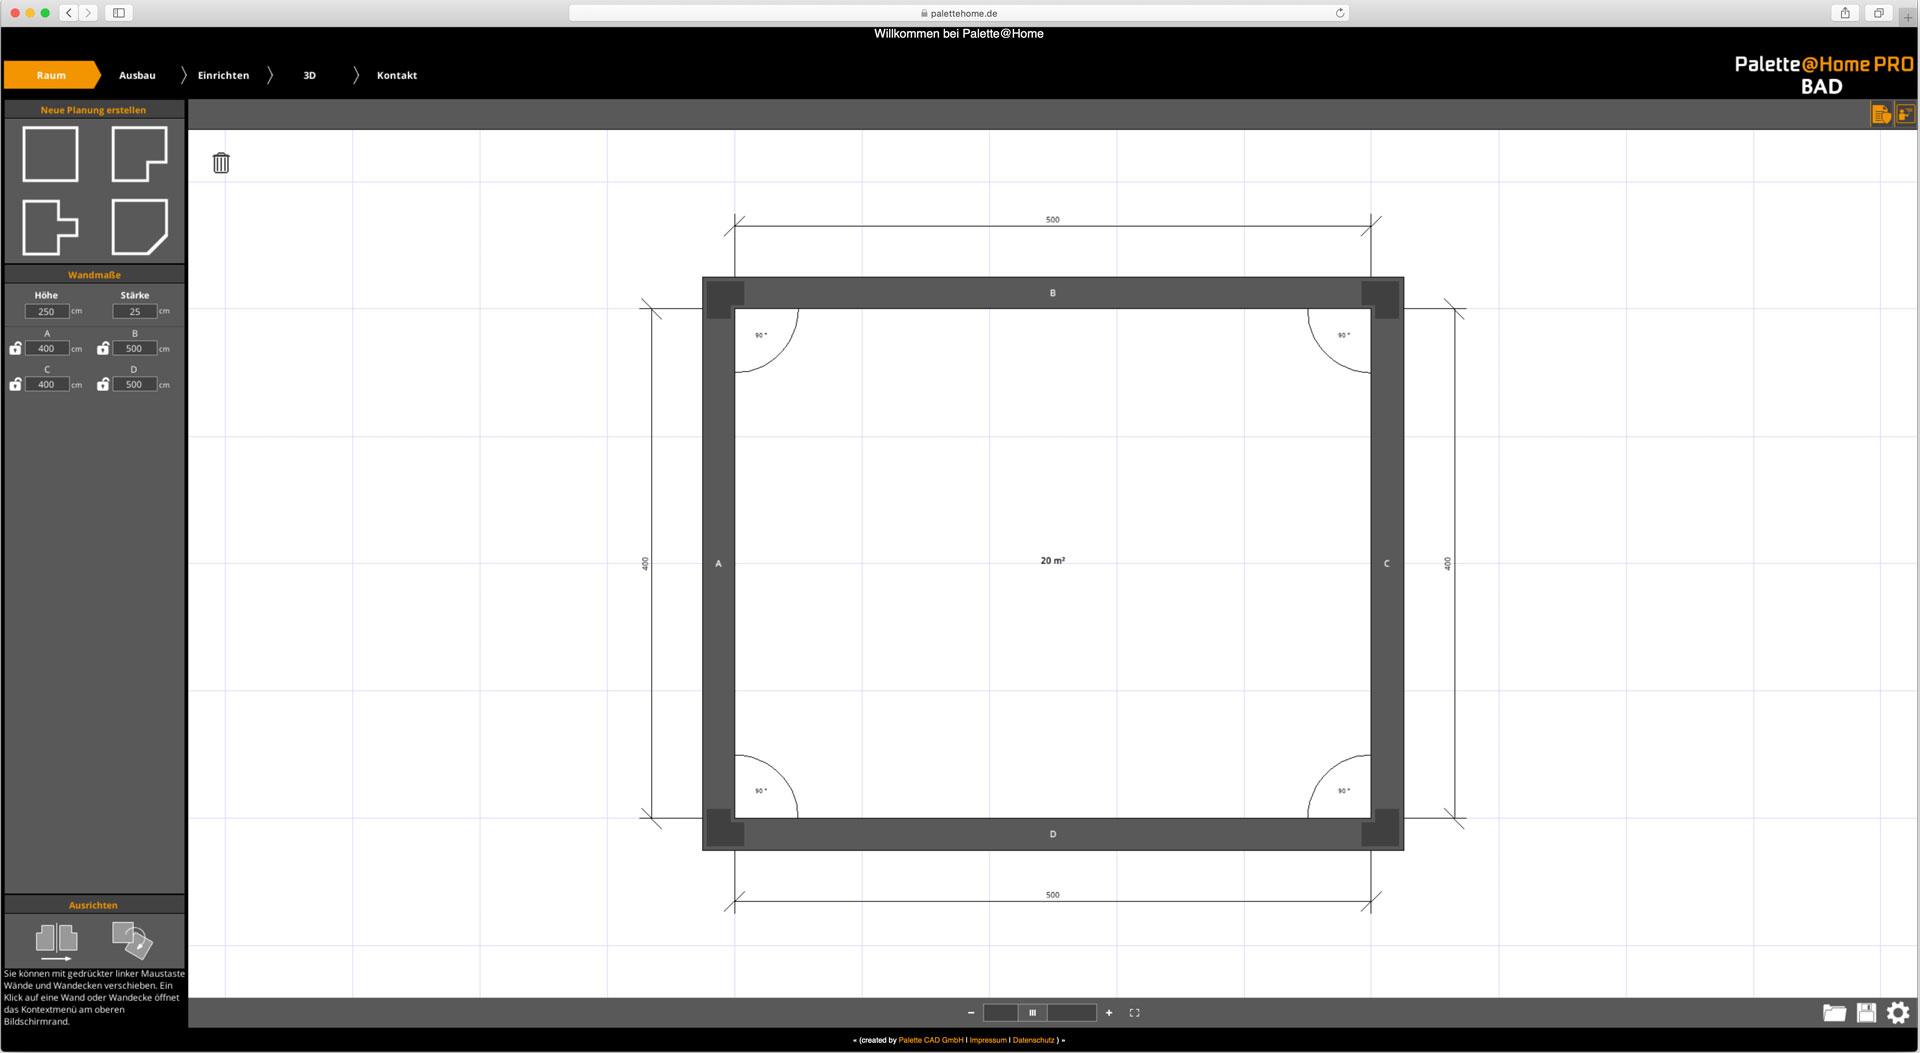 Palette CAD